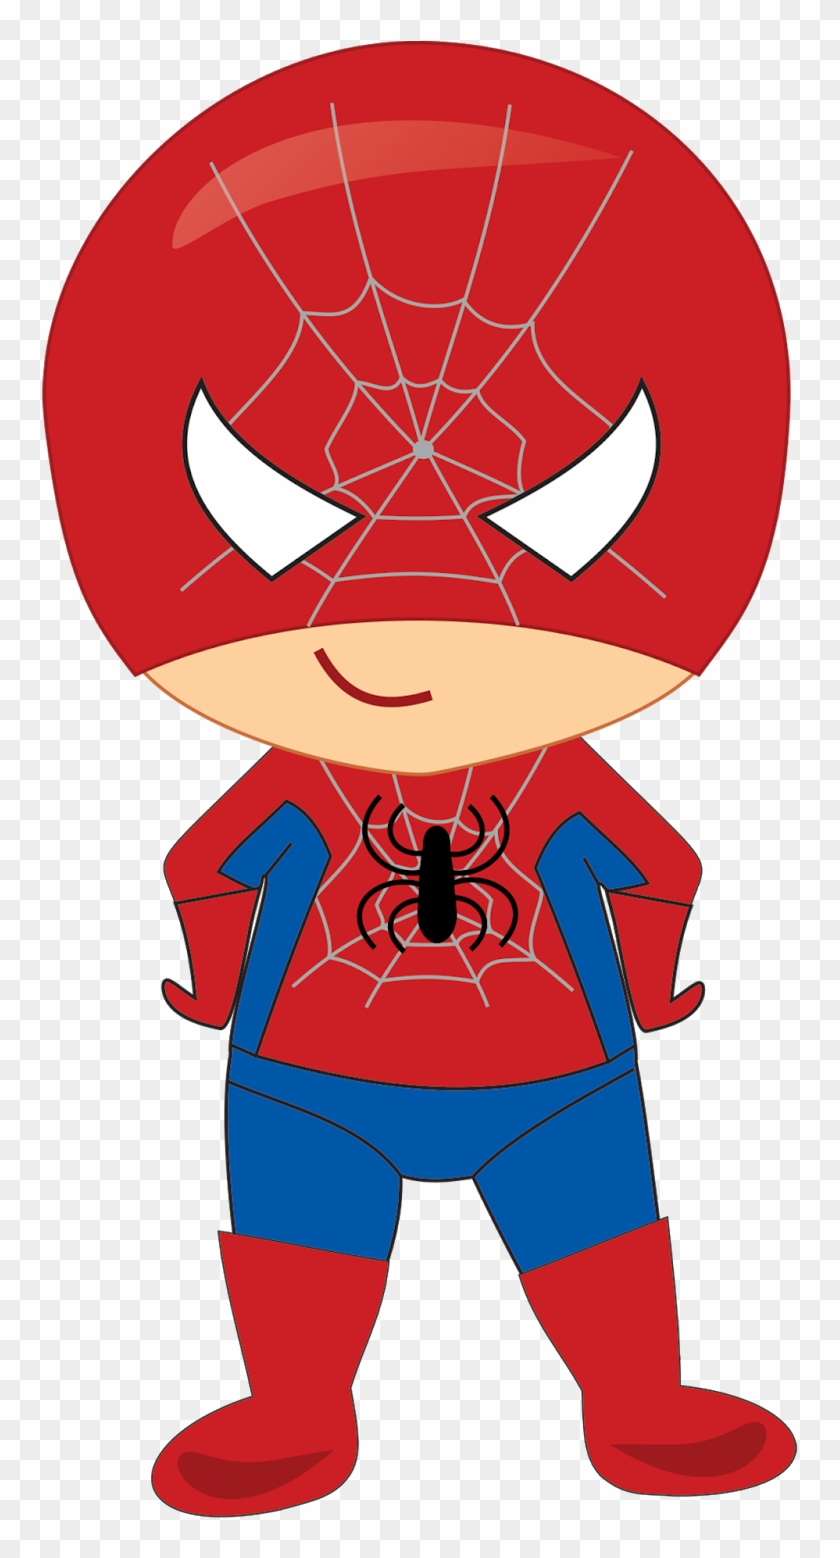 Superhero Clipart Png.